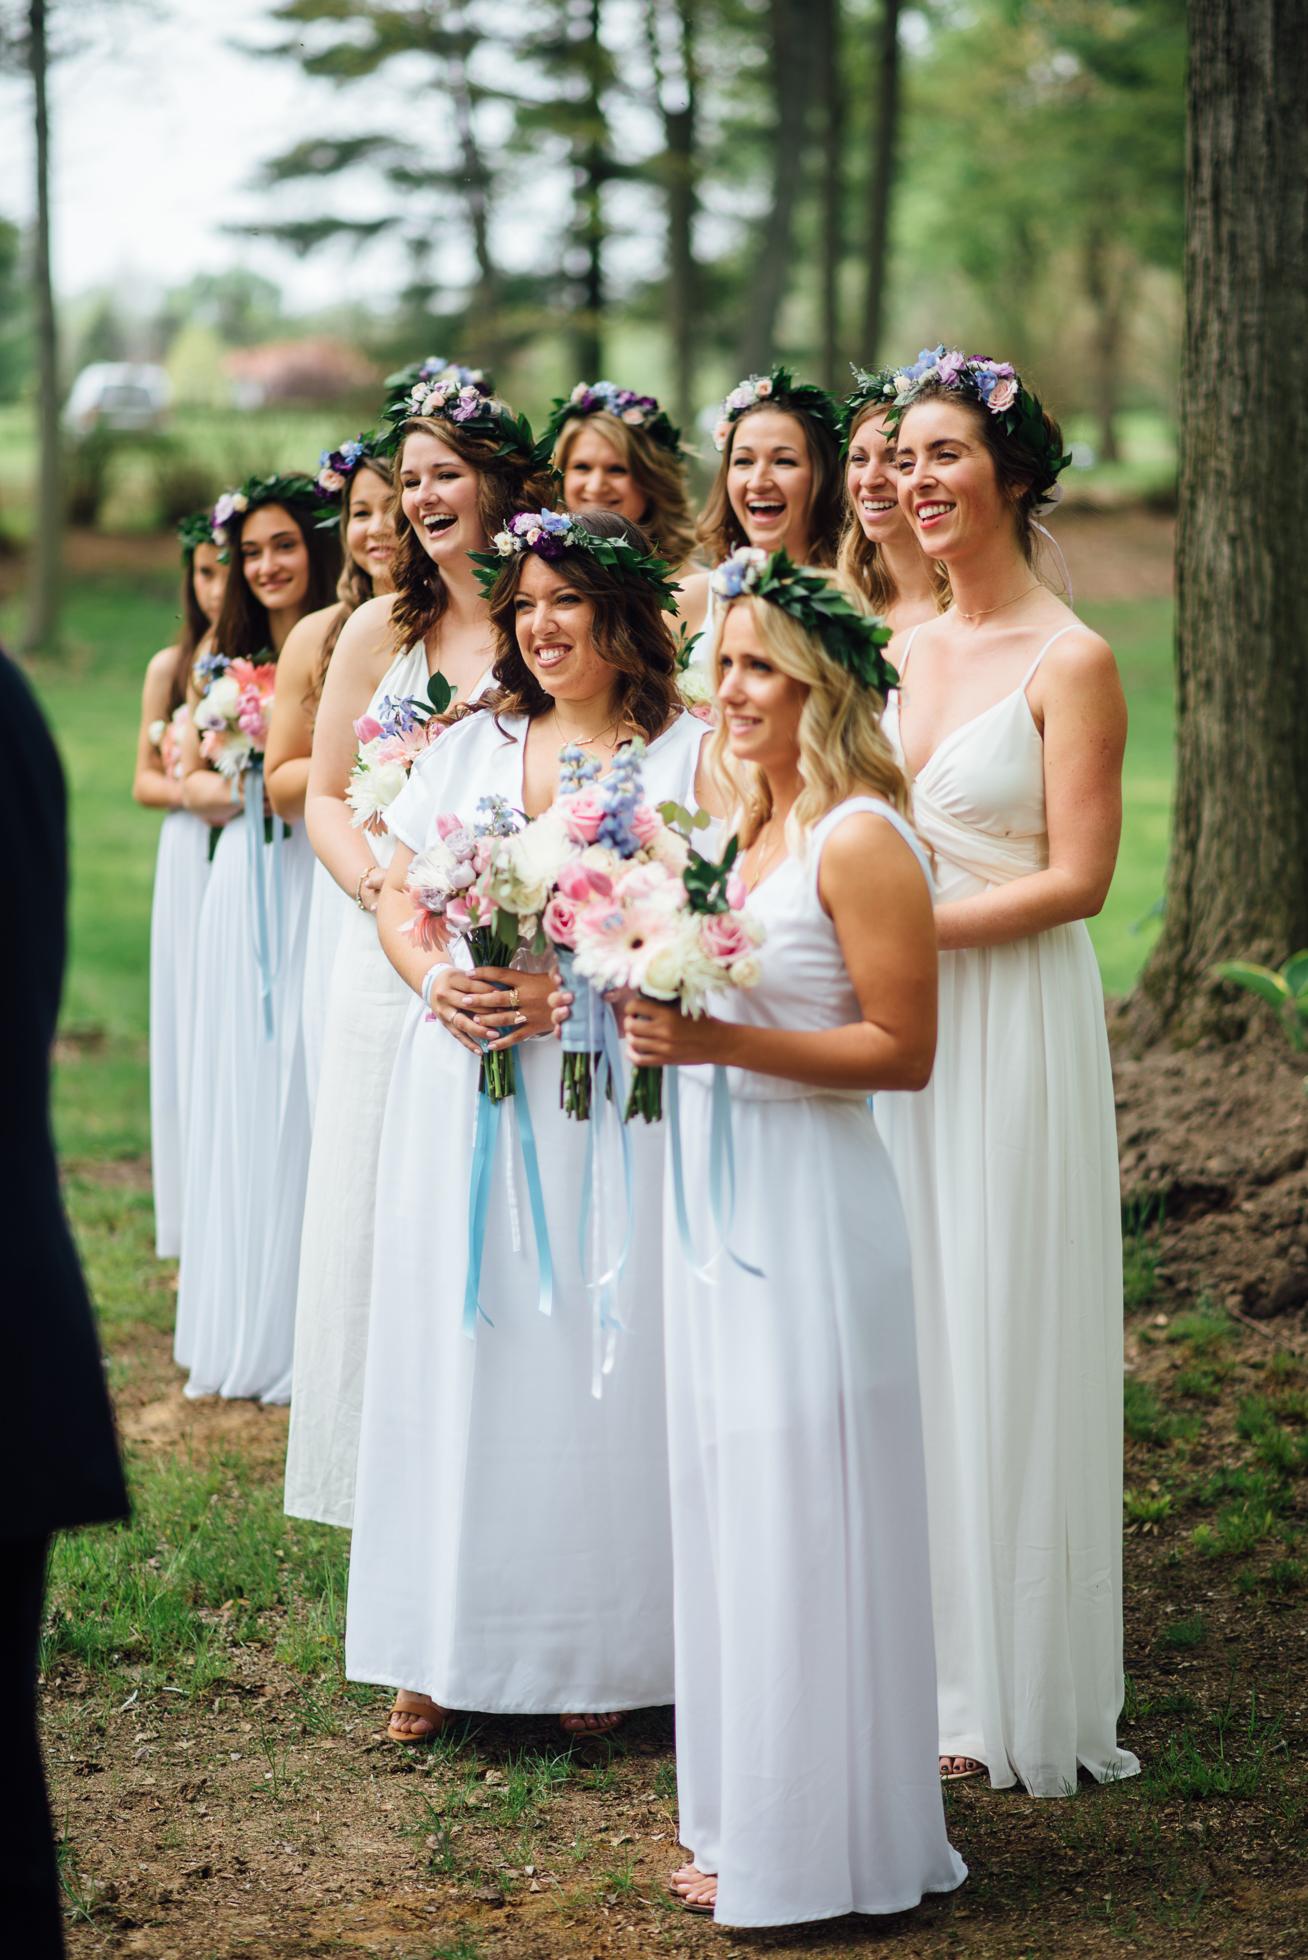 Fernwood Hills London Ontario Bohemian Wedding - bridesmaids wearing mismatching white dresses and flower crowns